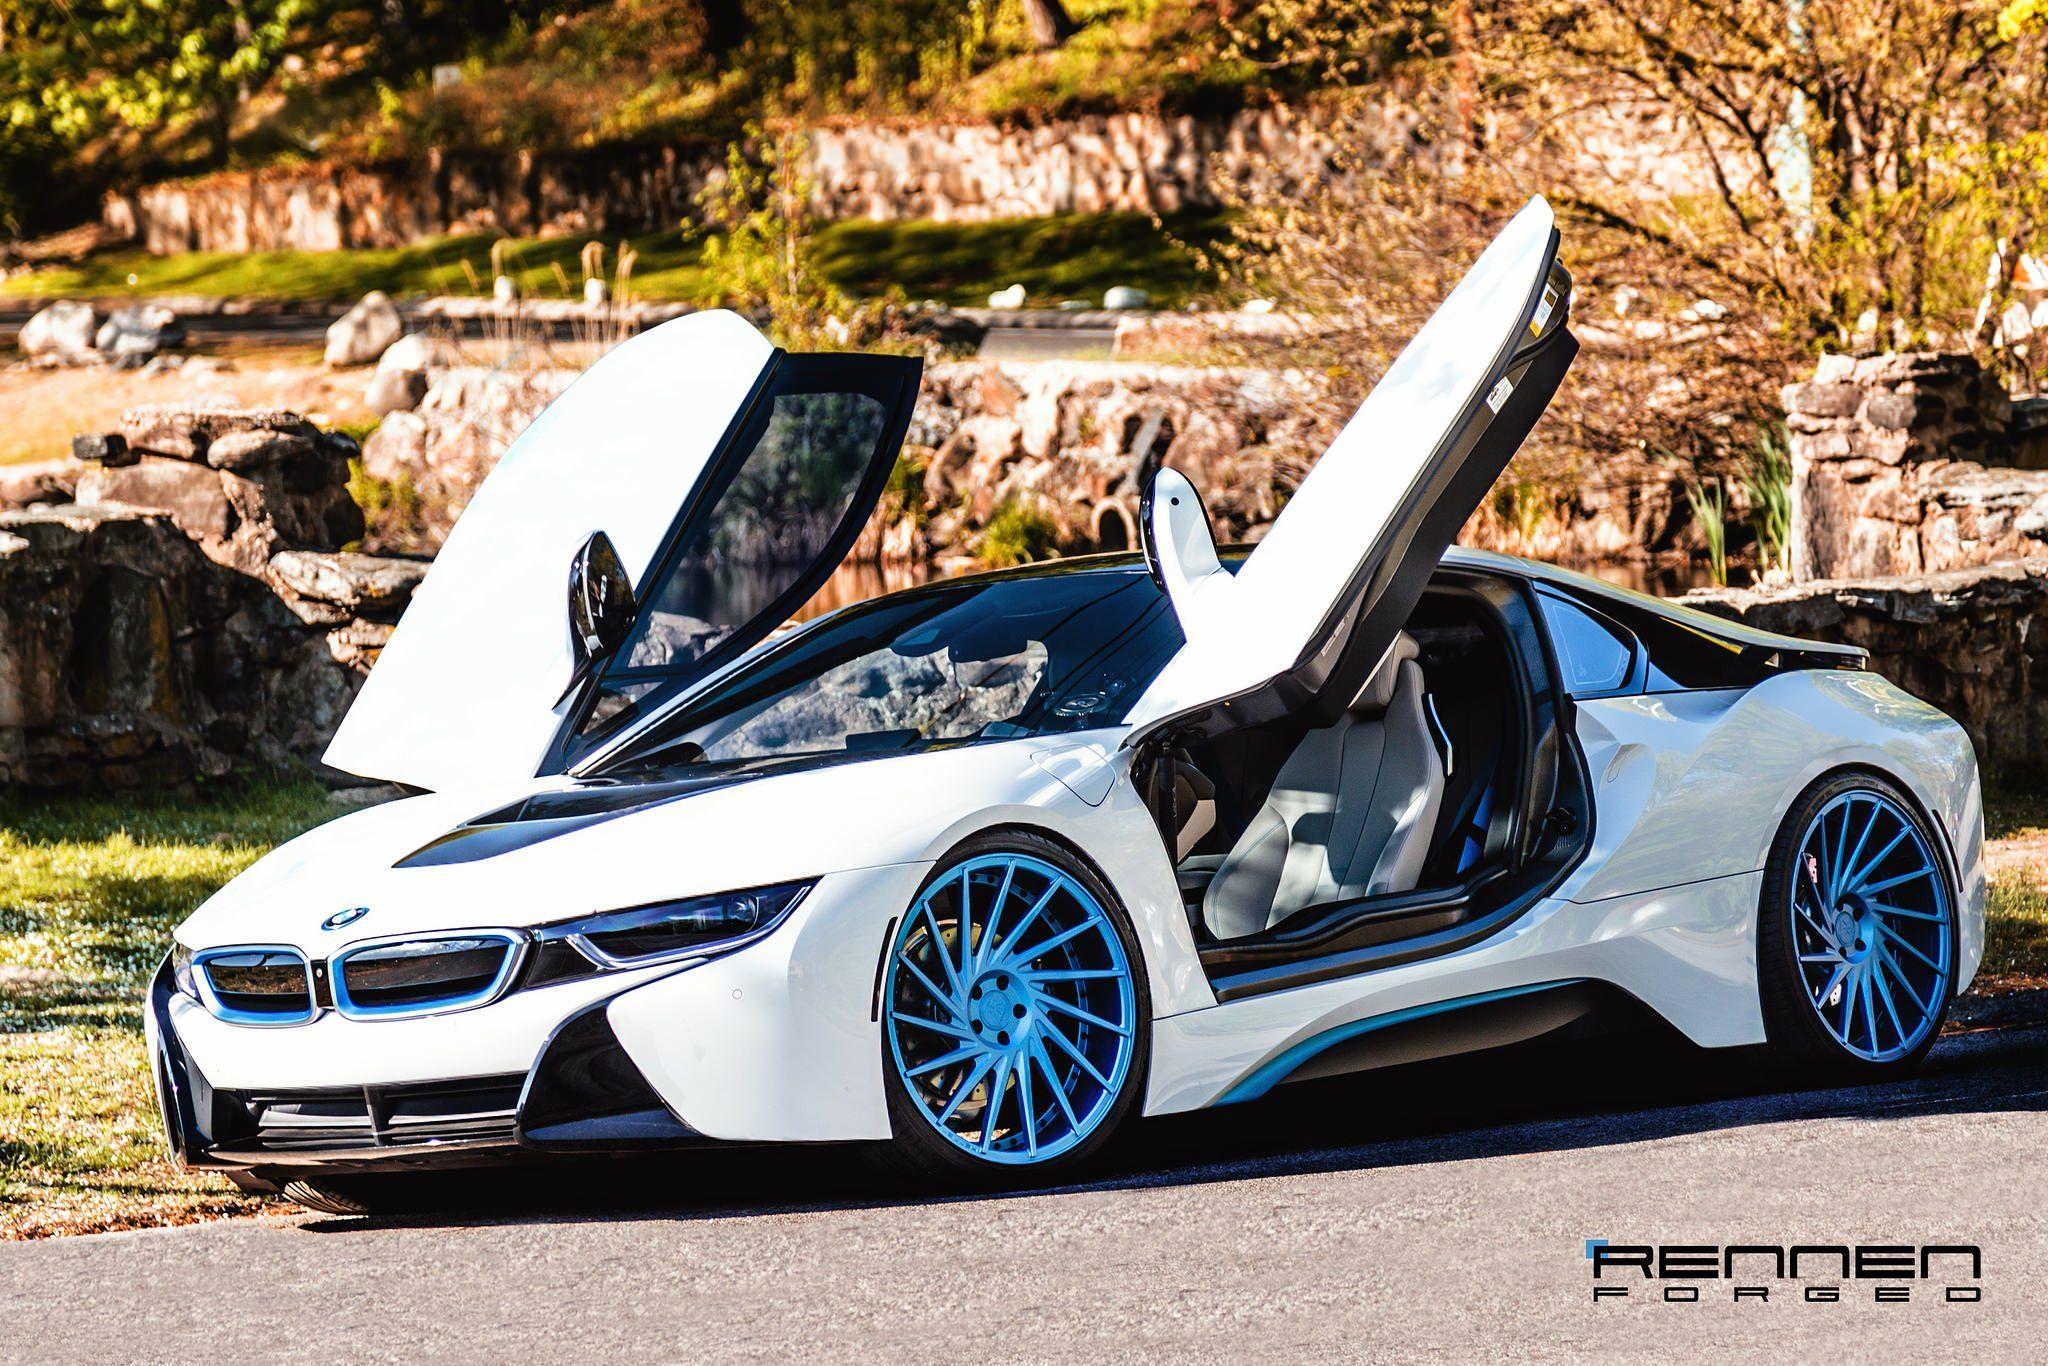 Revolutionary Machine White Bmw I8 On Blue Forged Rennen Wheels Dream Cars Bmw Bmw I8 Bmw